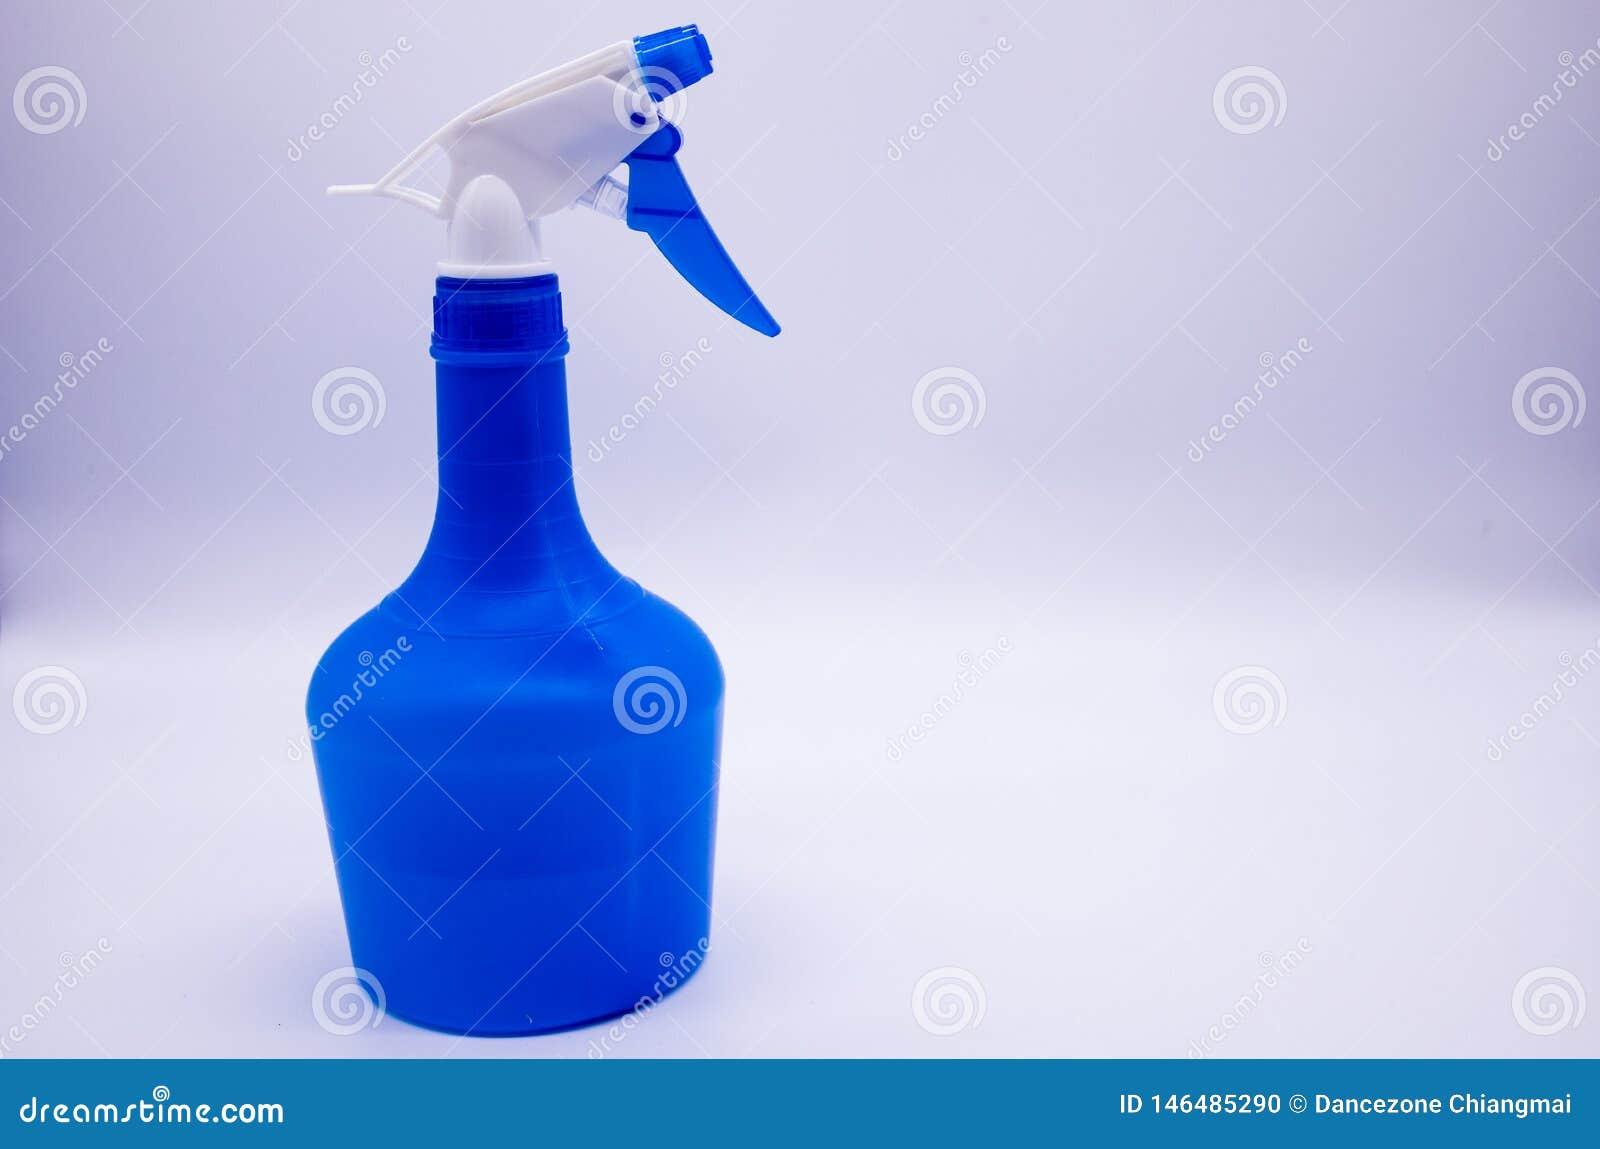 Blue spray bottle on white background